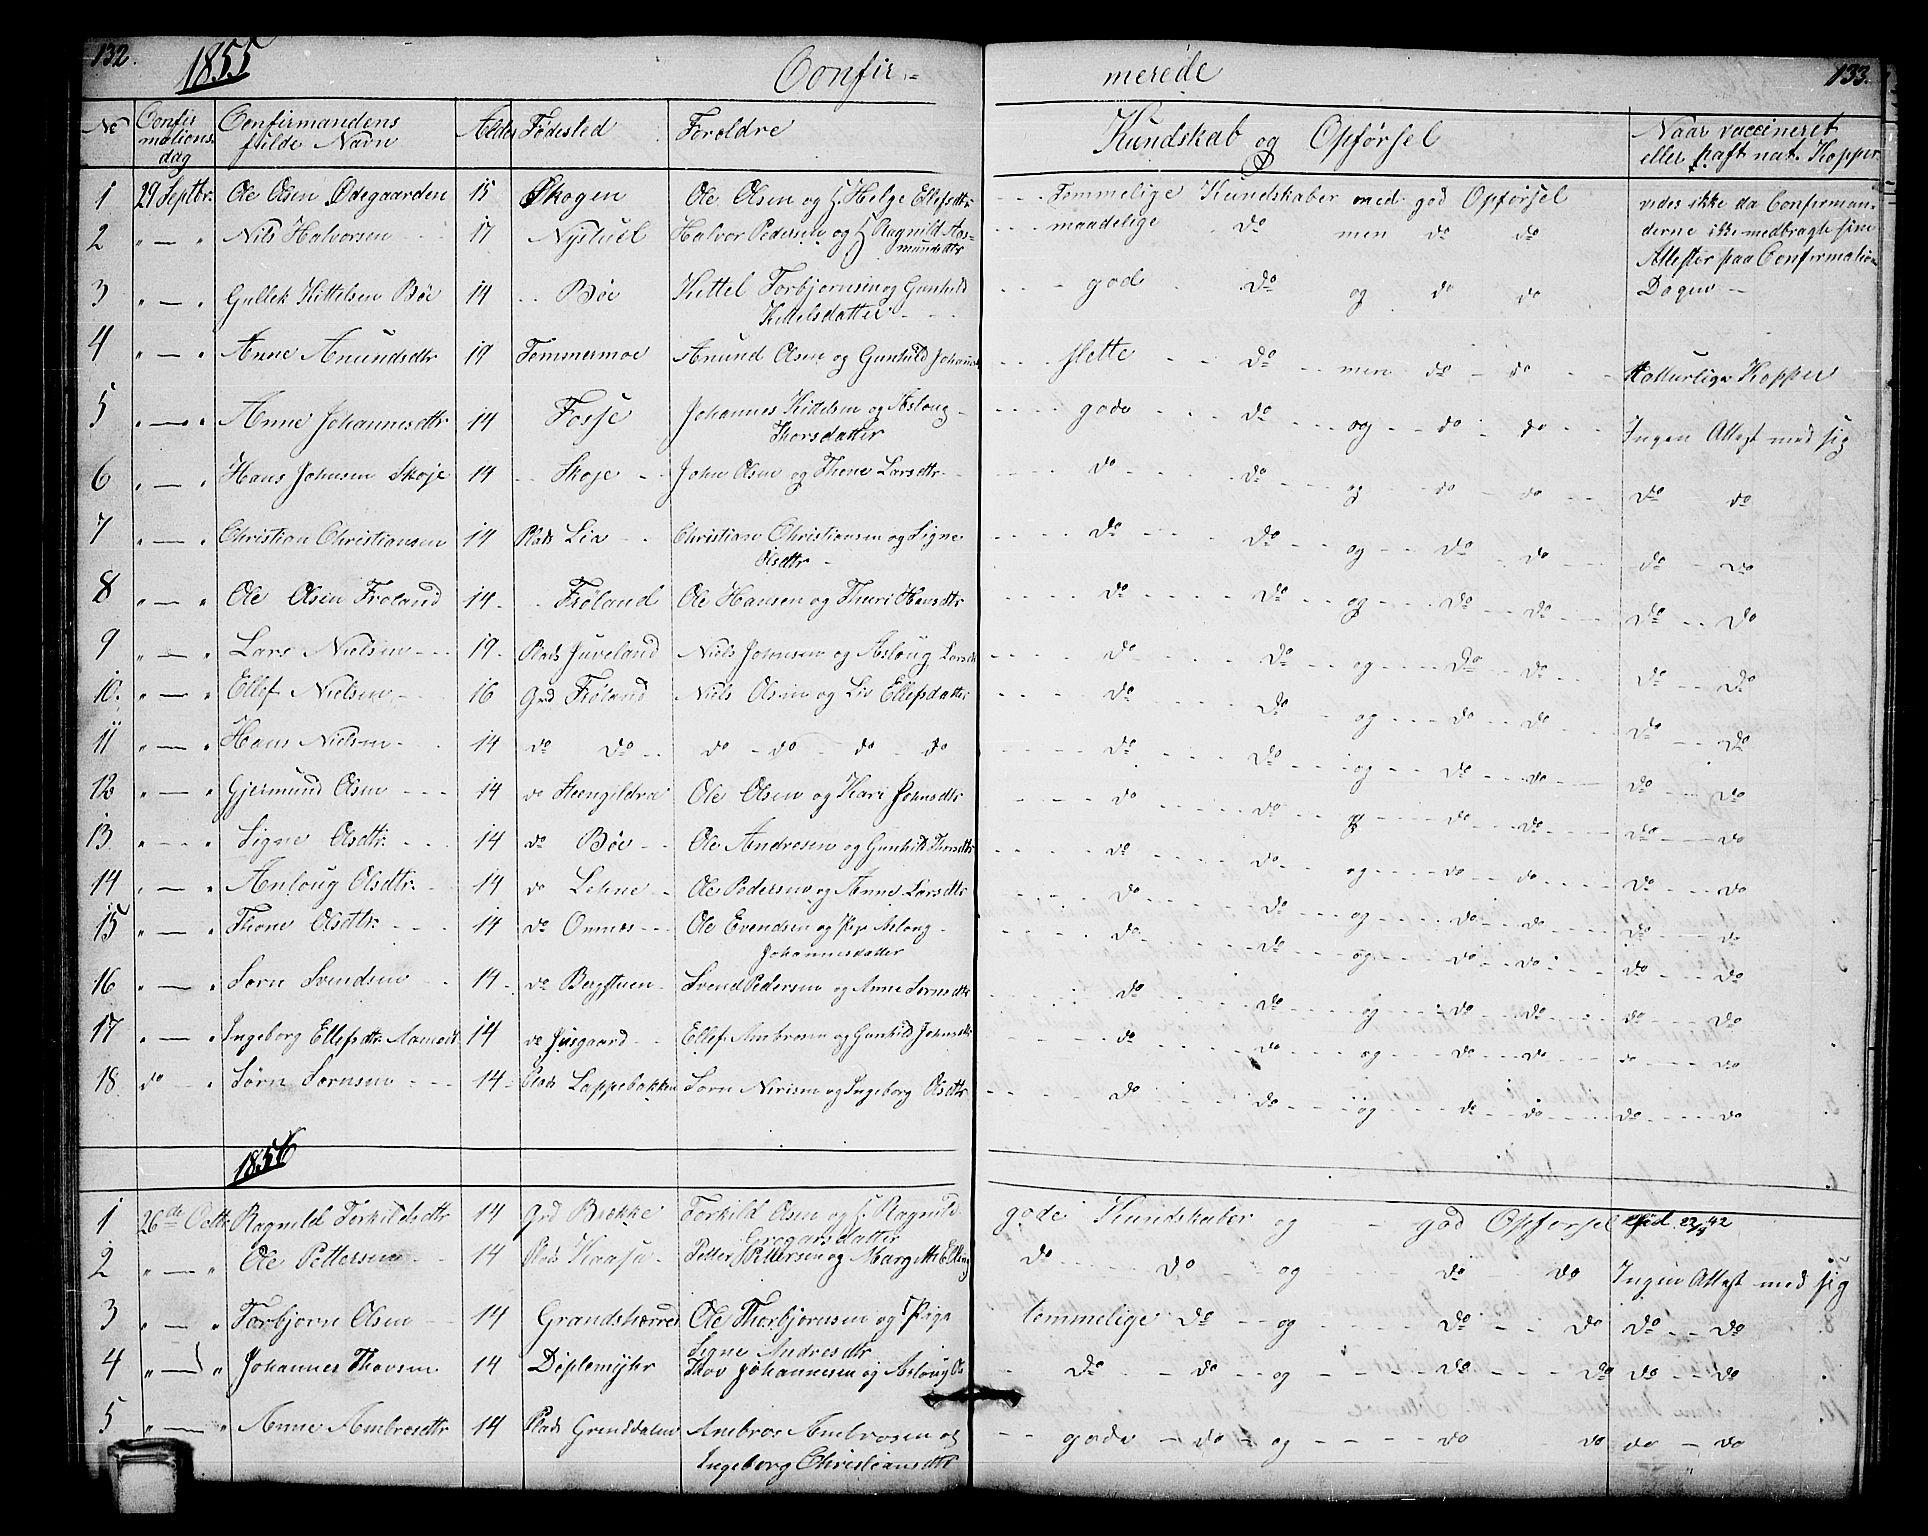 SAKO, Hjartdal kirkebøker, G/Gb/L0002: Klokkerbok nr. II 2, 1854-1884, s. 132-133